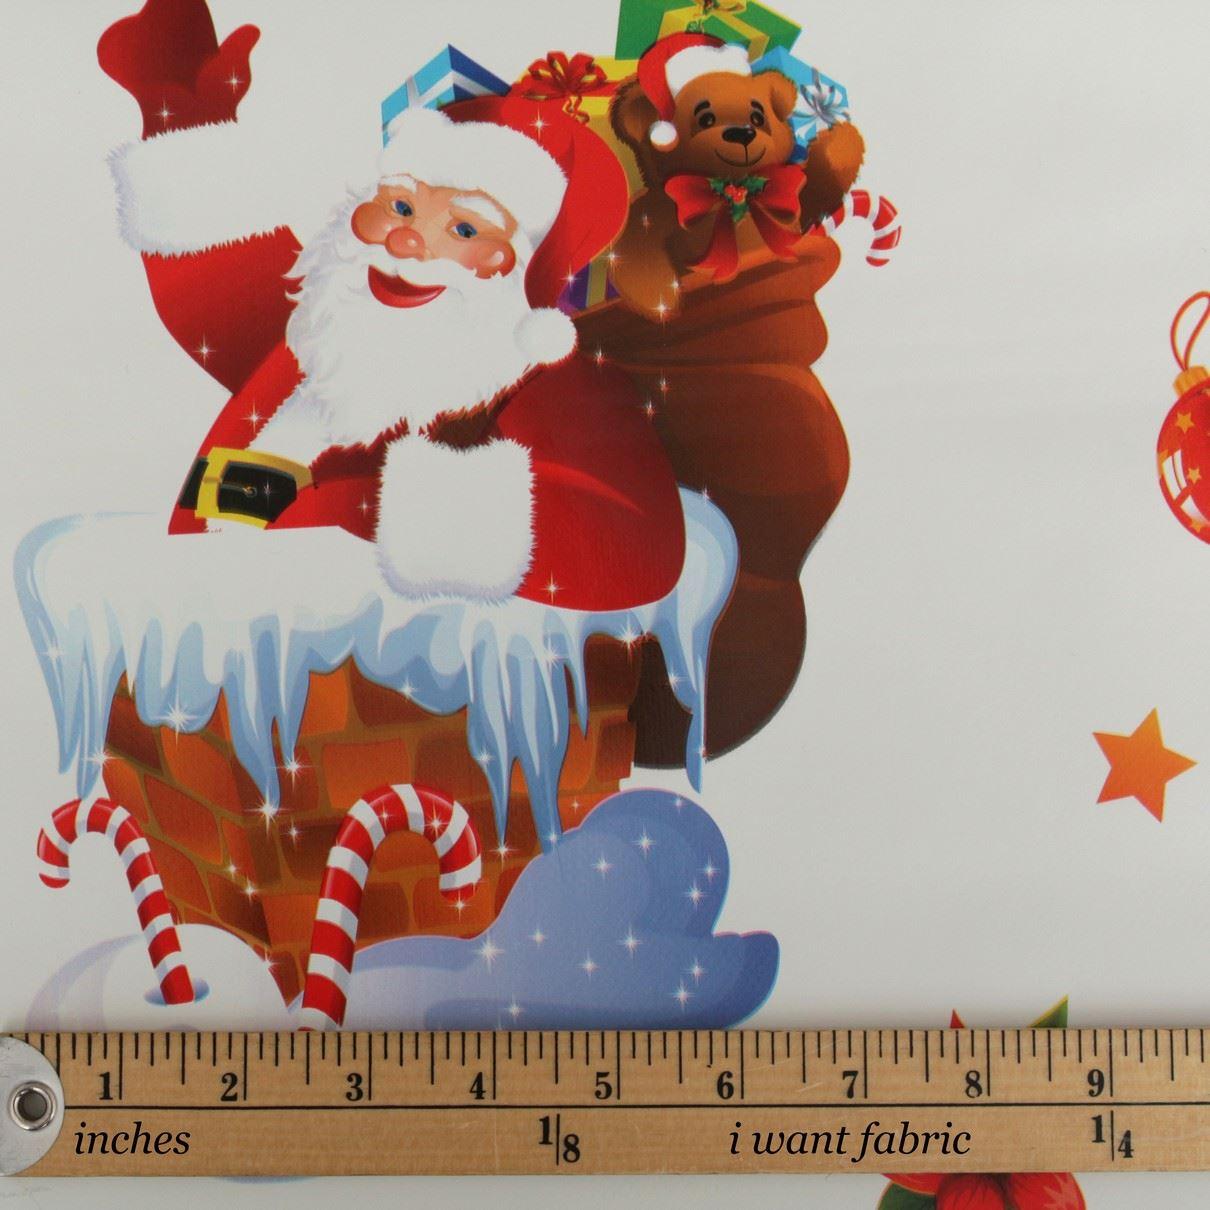 thumbnail 25 - CHRISTMAS PVC OILCLOTH VINYL FABRIC XMAS KITCHEN TABLE WIPECLEAN TABLECLOTHS